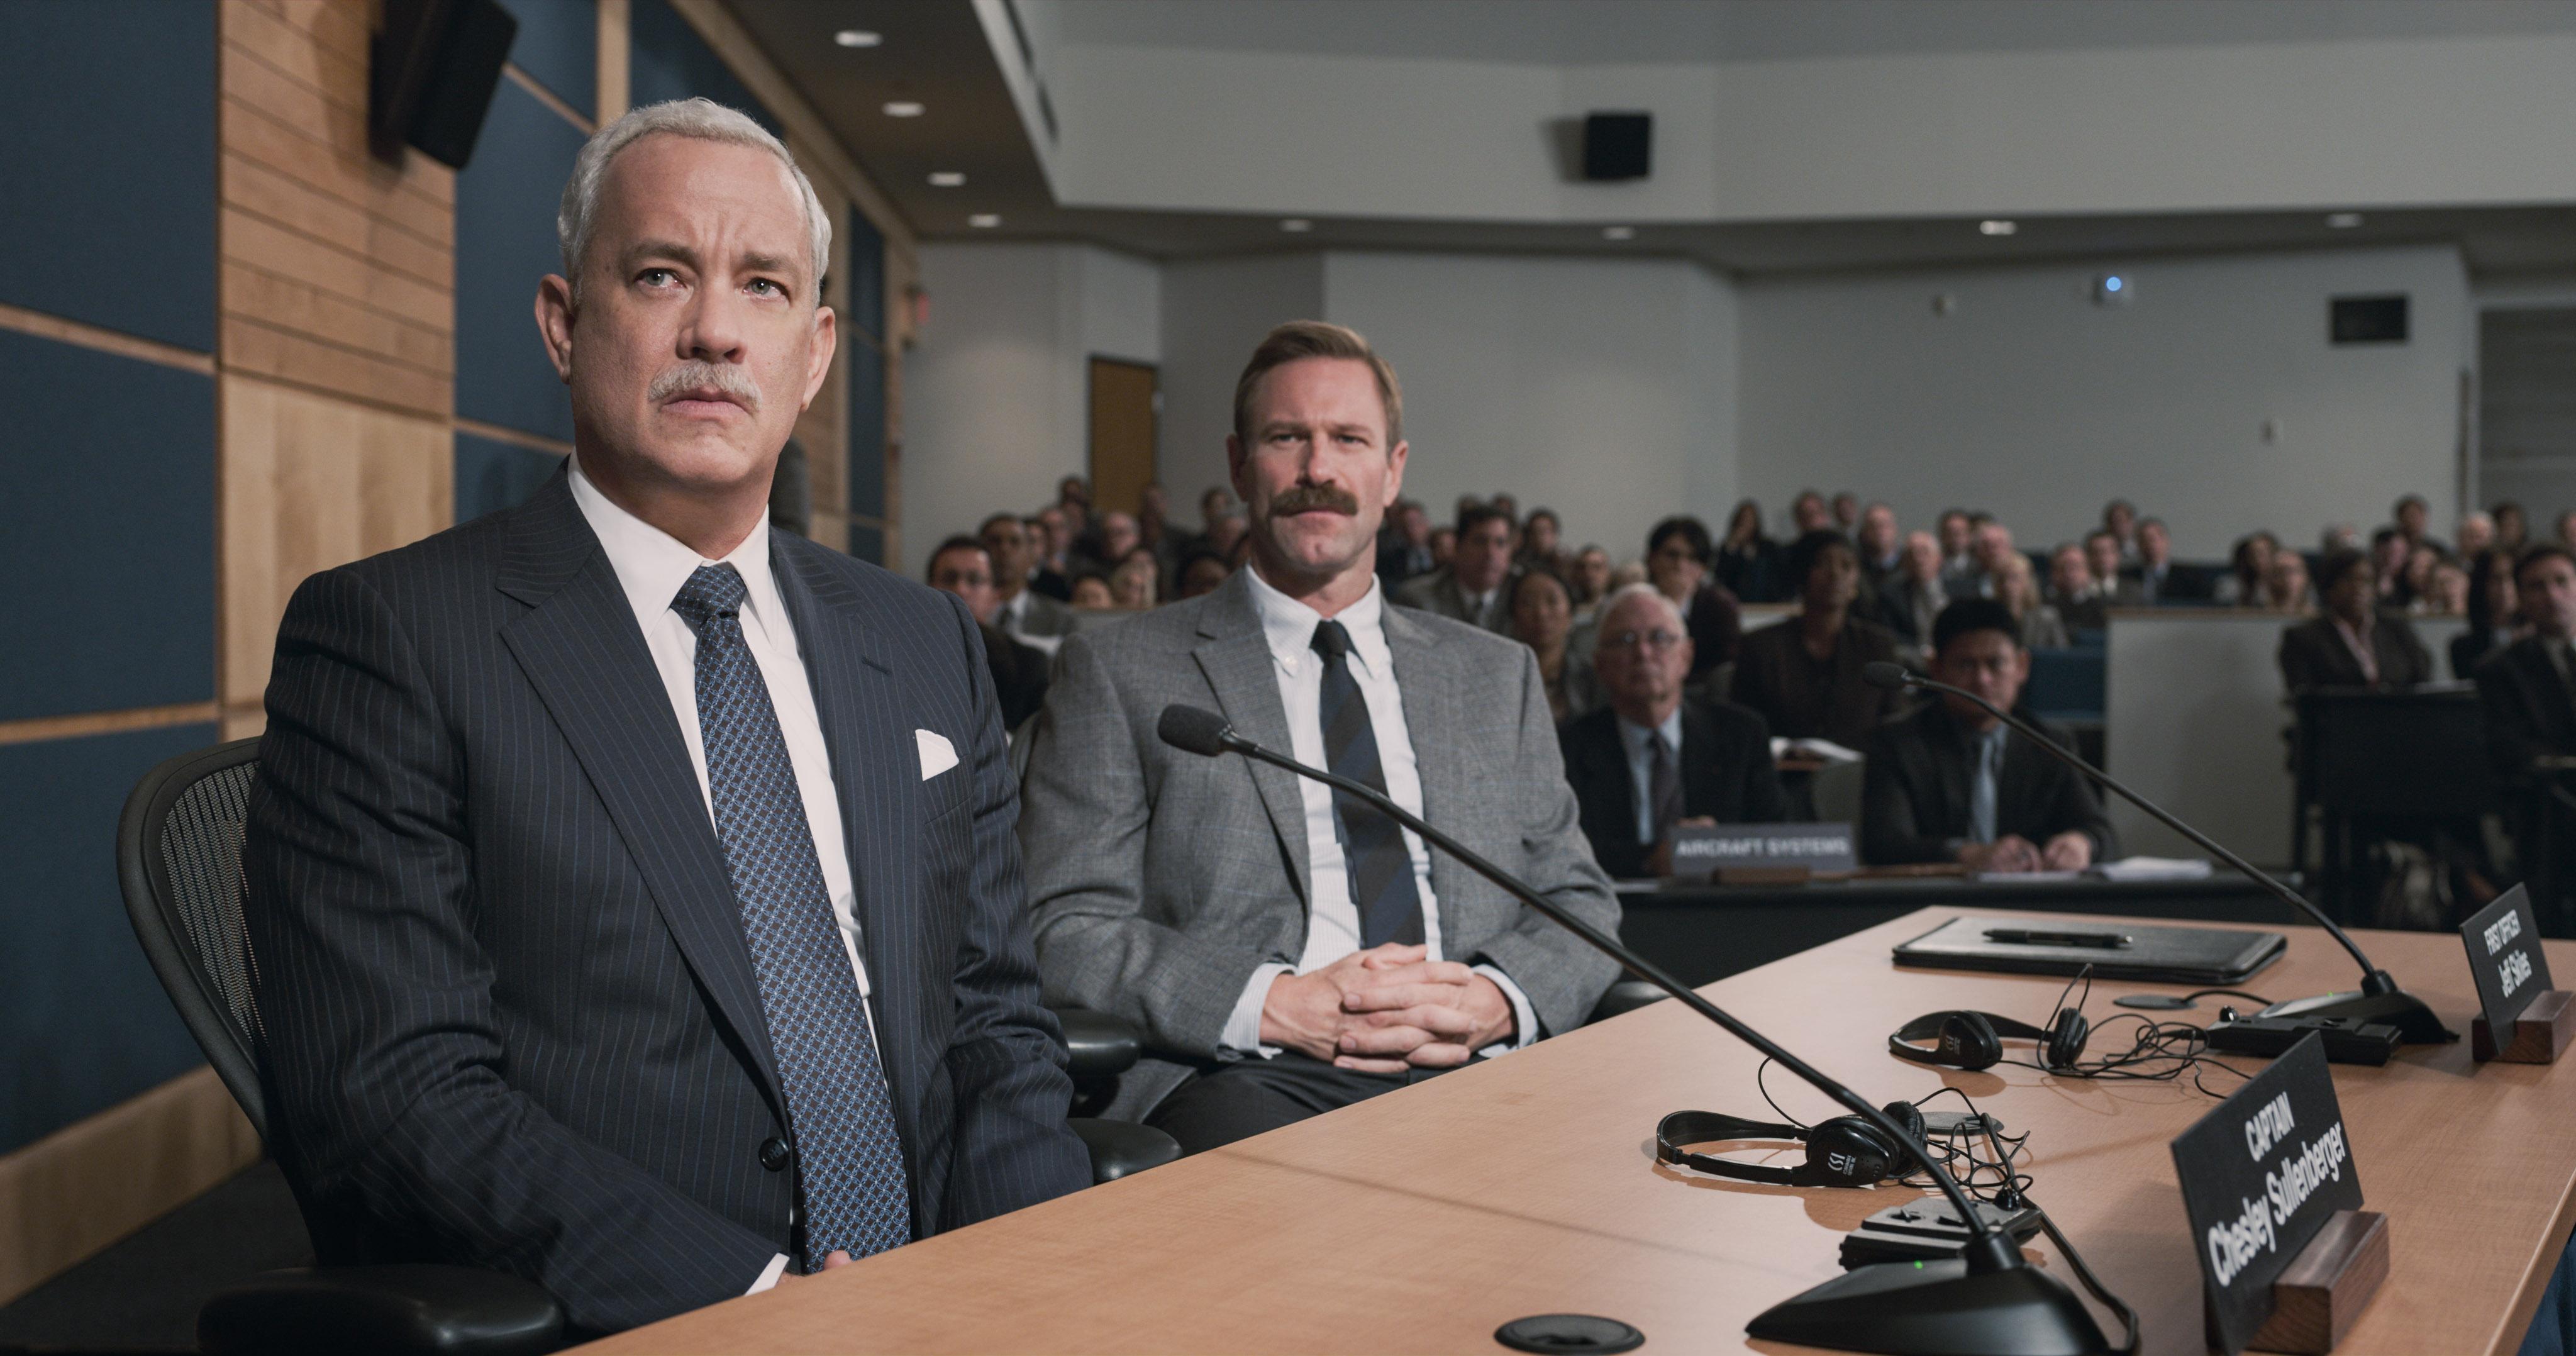 Tom Hanks, Aaron Eckhart - Sully.jpeg